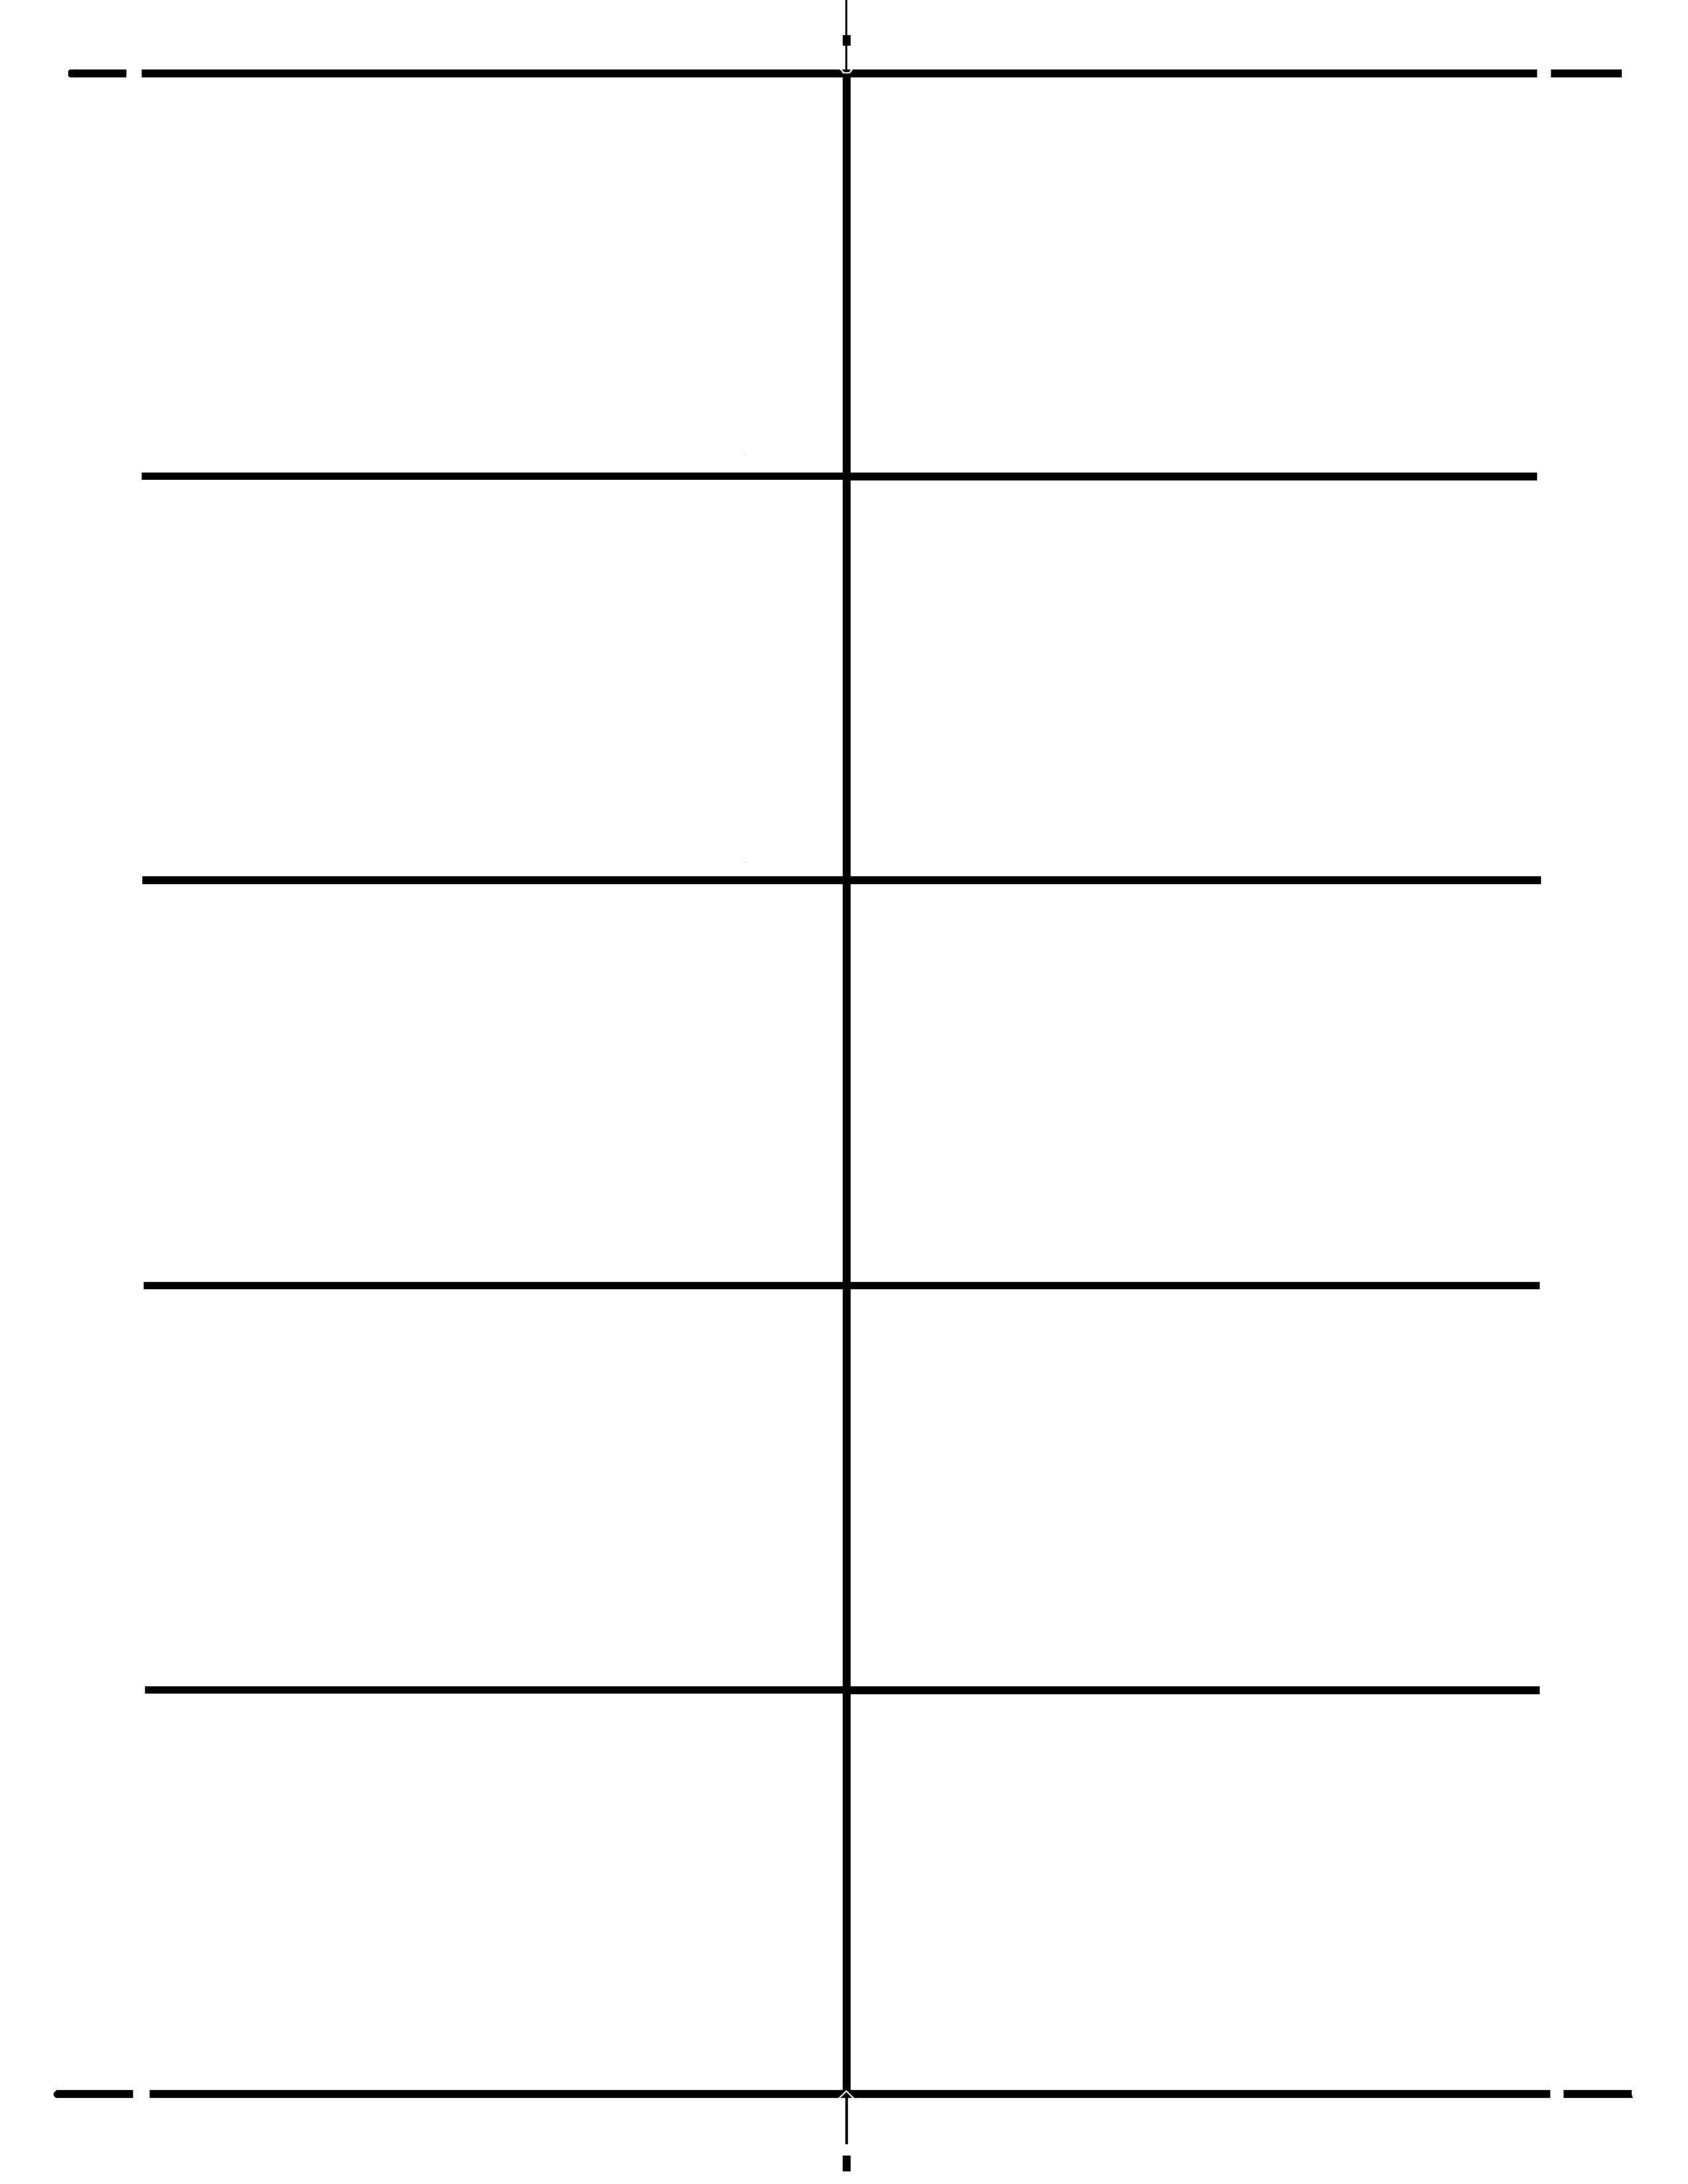 Standard Blank Business Card Template Word Mac Design | Business - Free Printable Business Card Templates